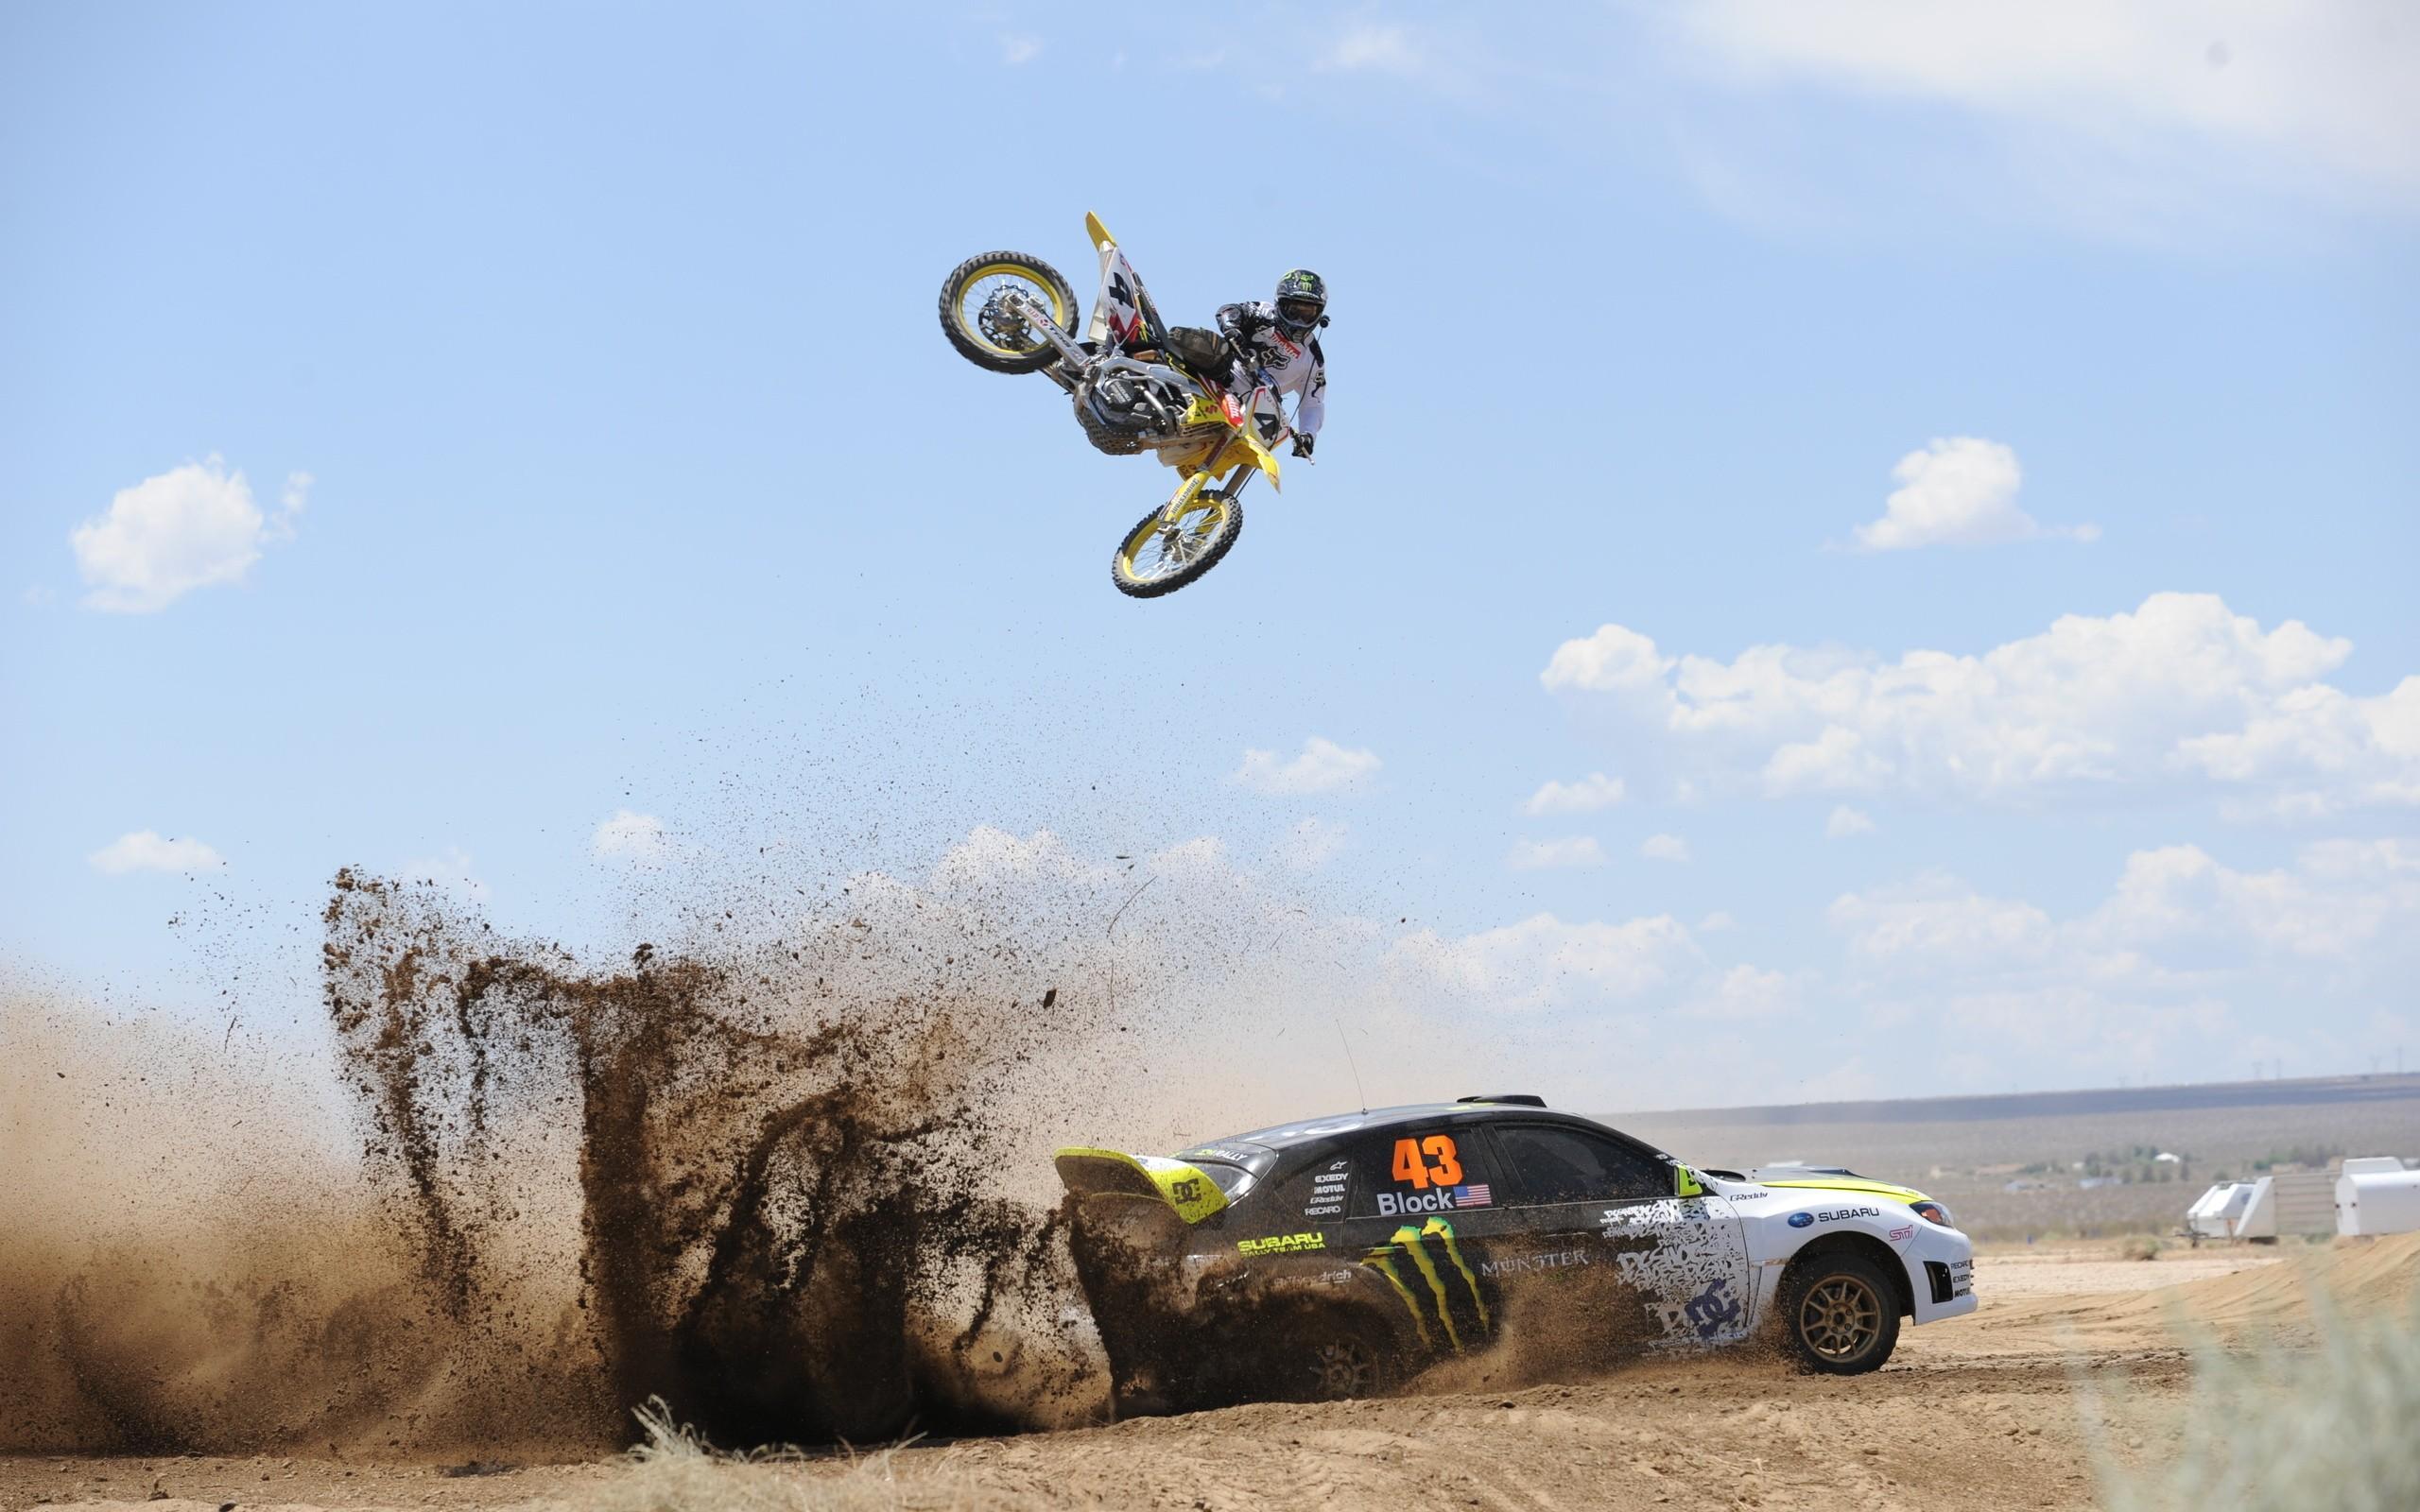 Salto de moto sobre auto - 2560x1600